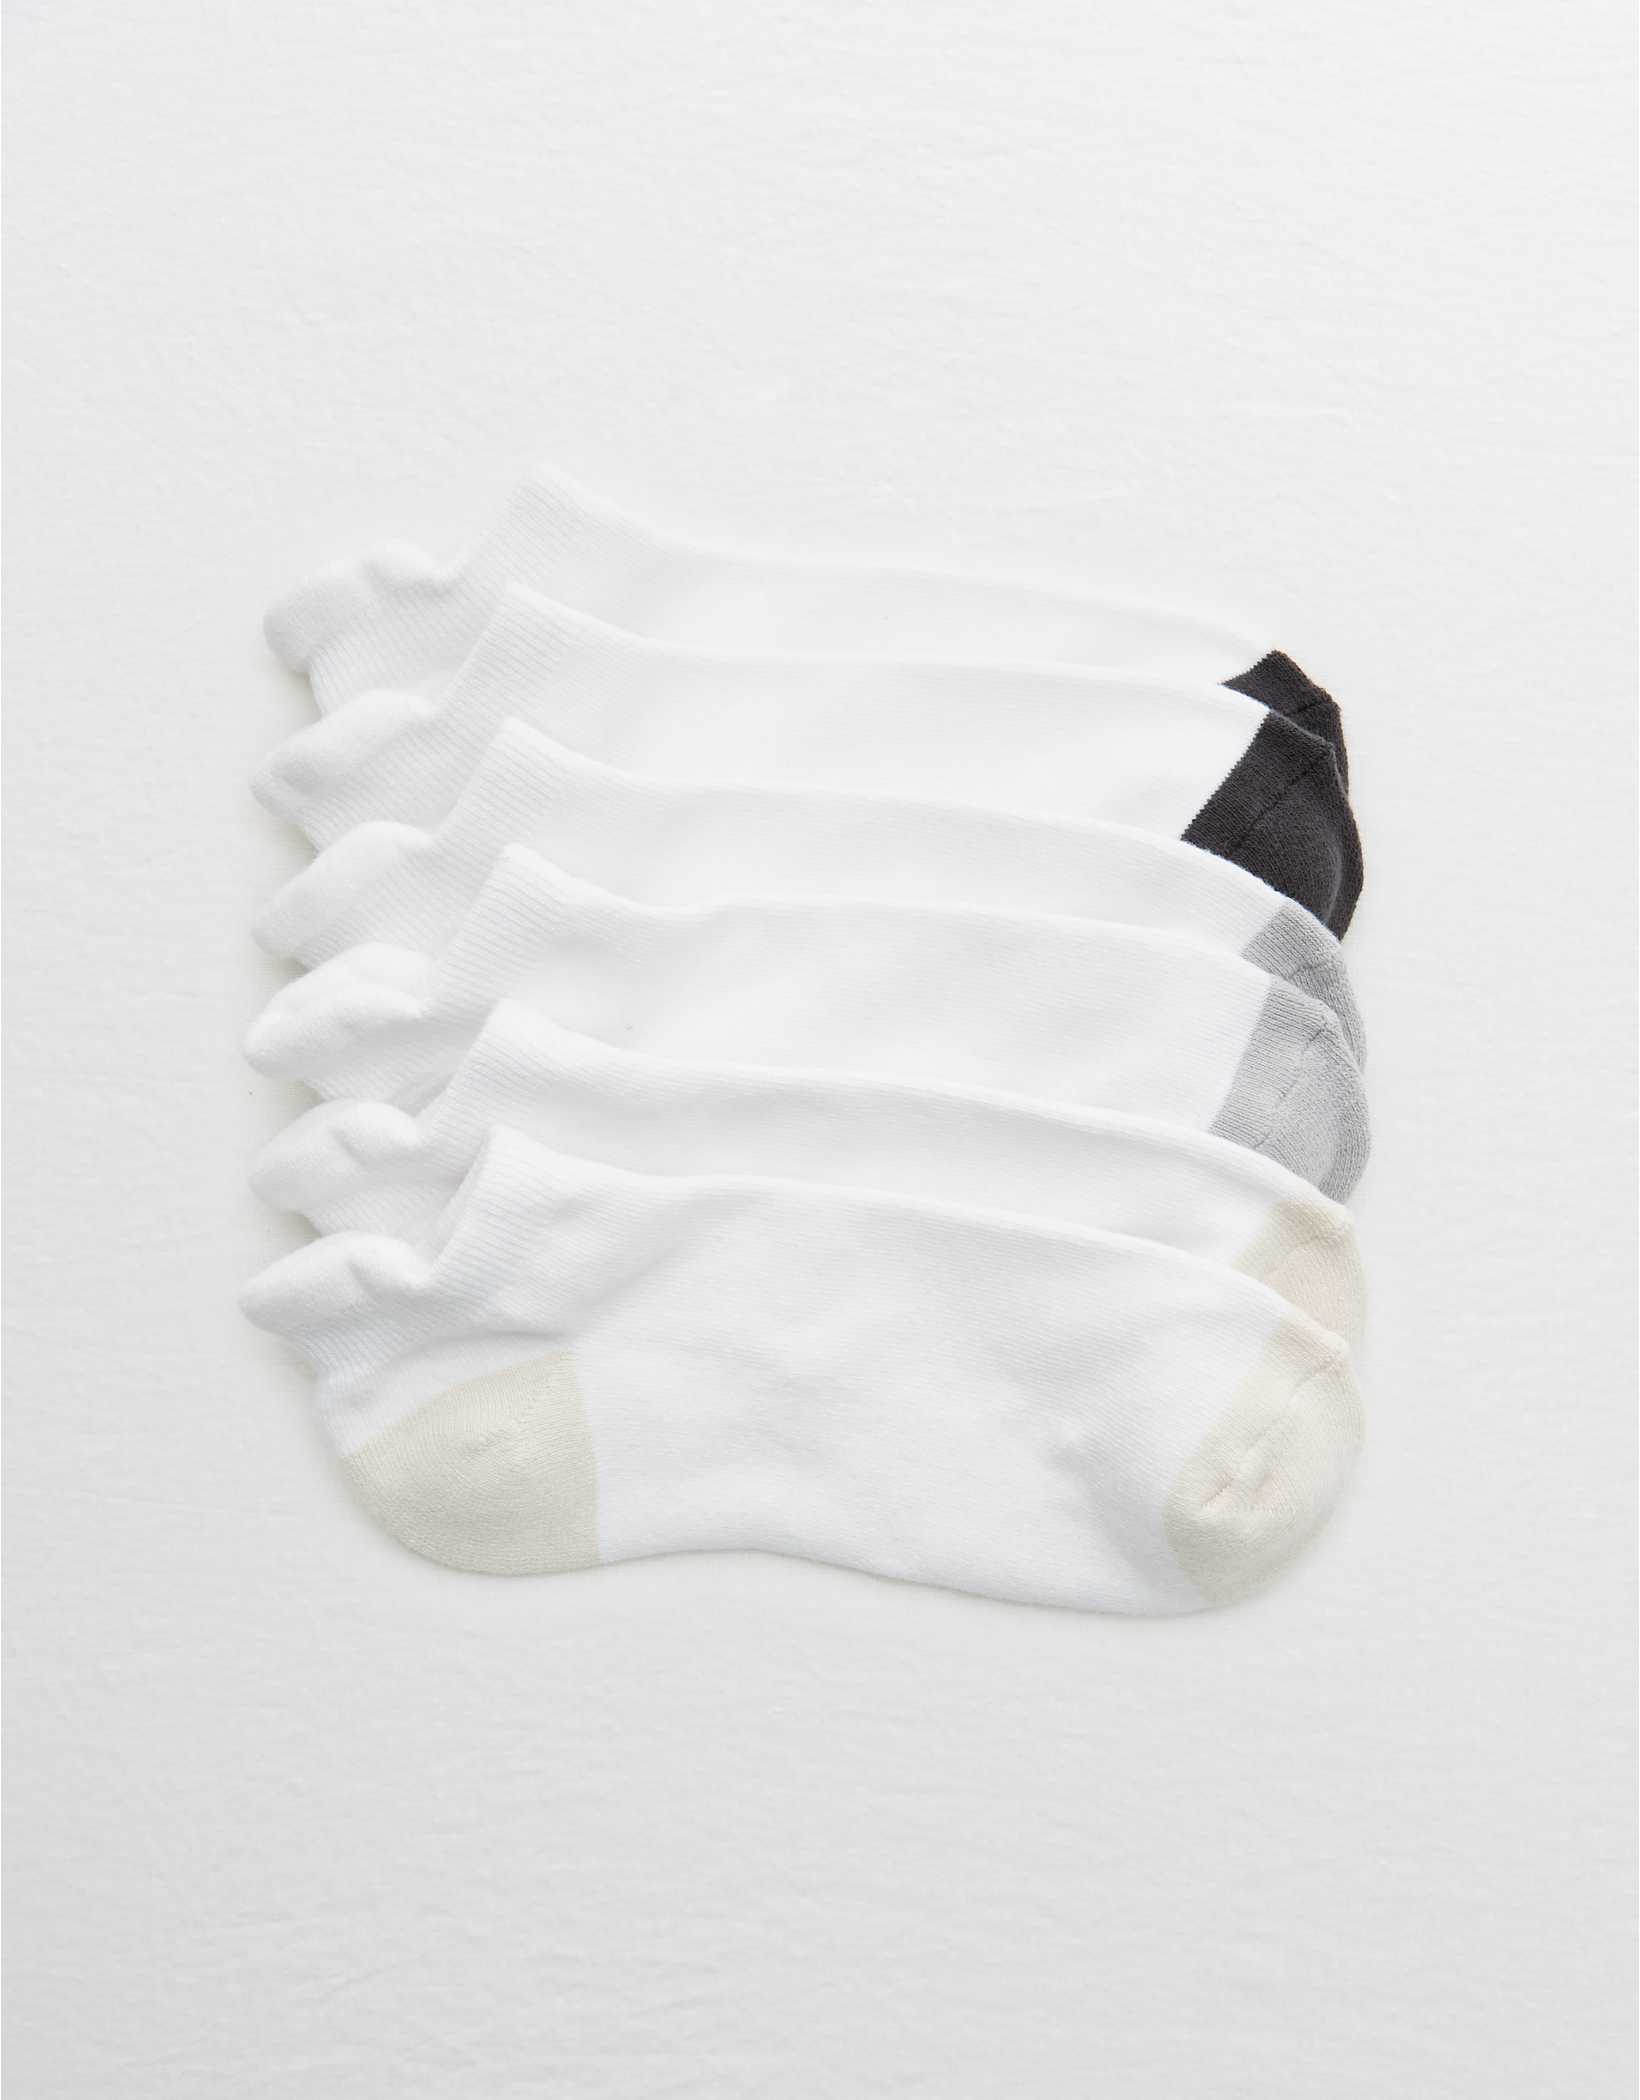 Aerie Sporty Ankle Socks